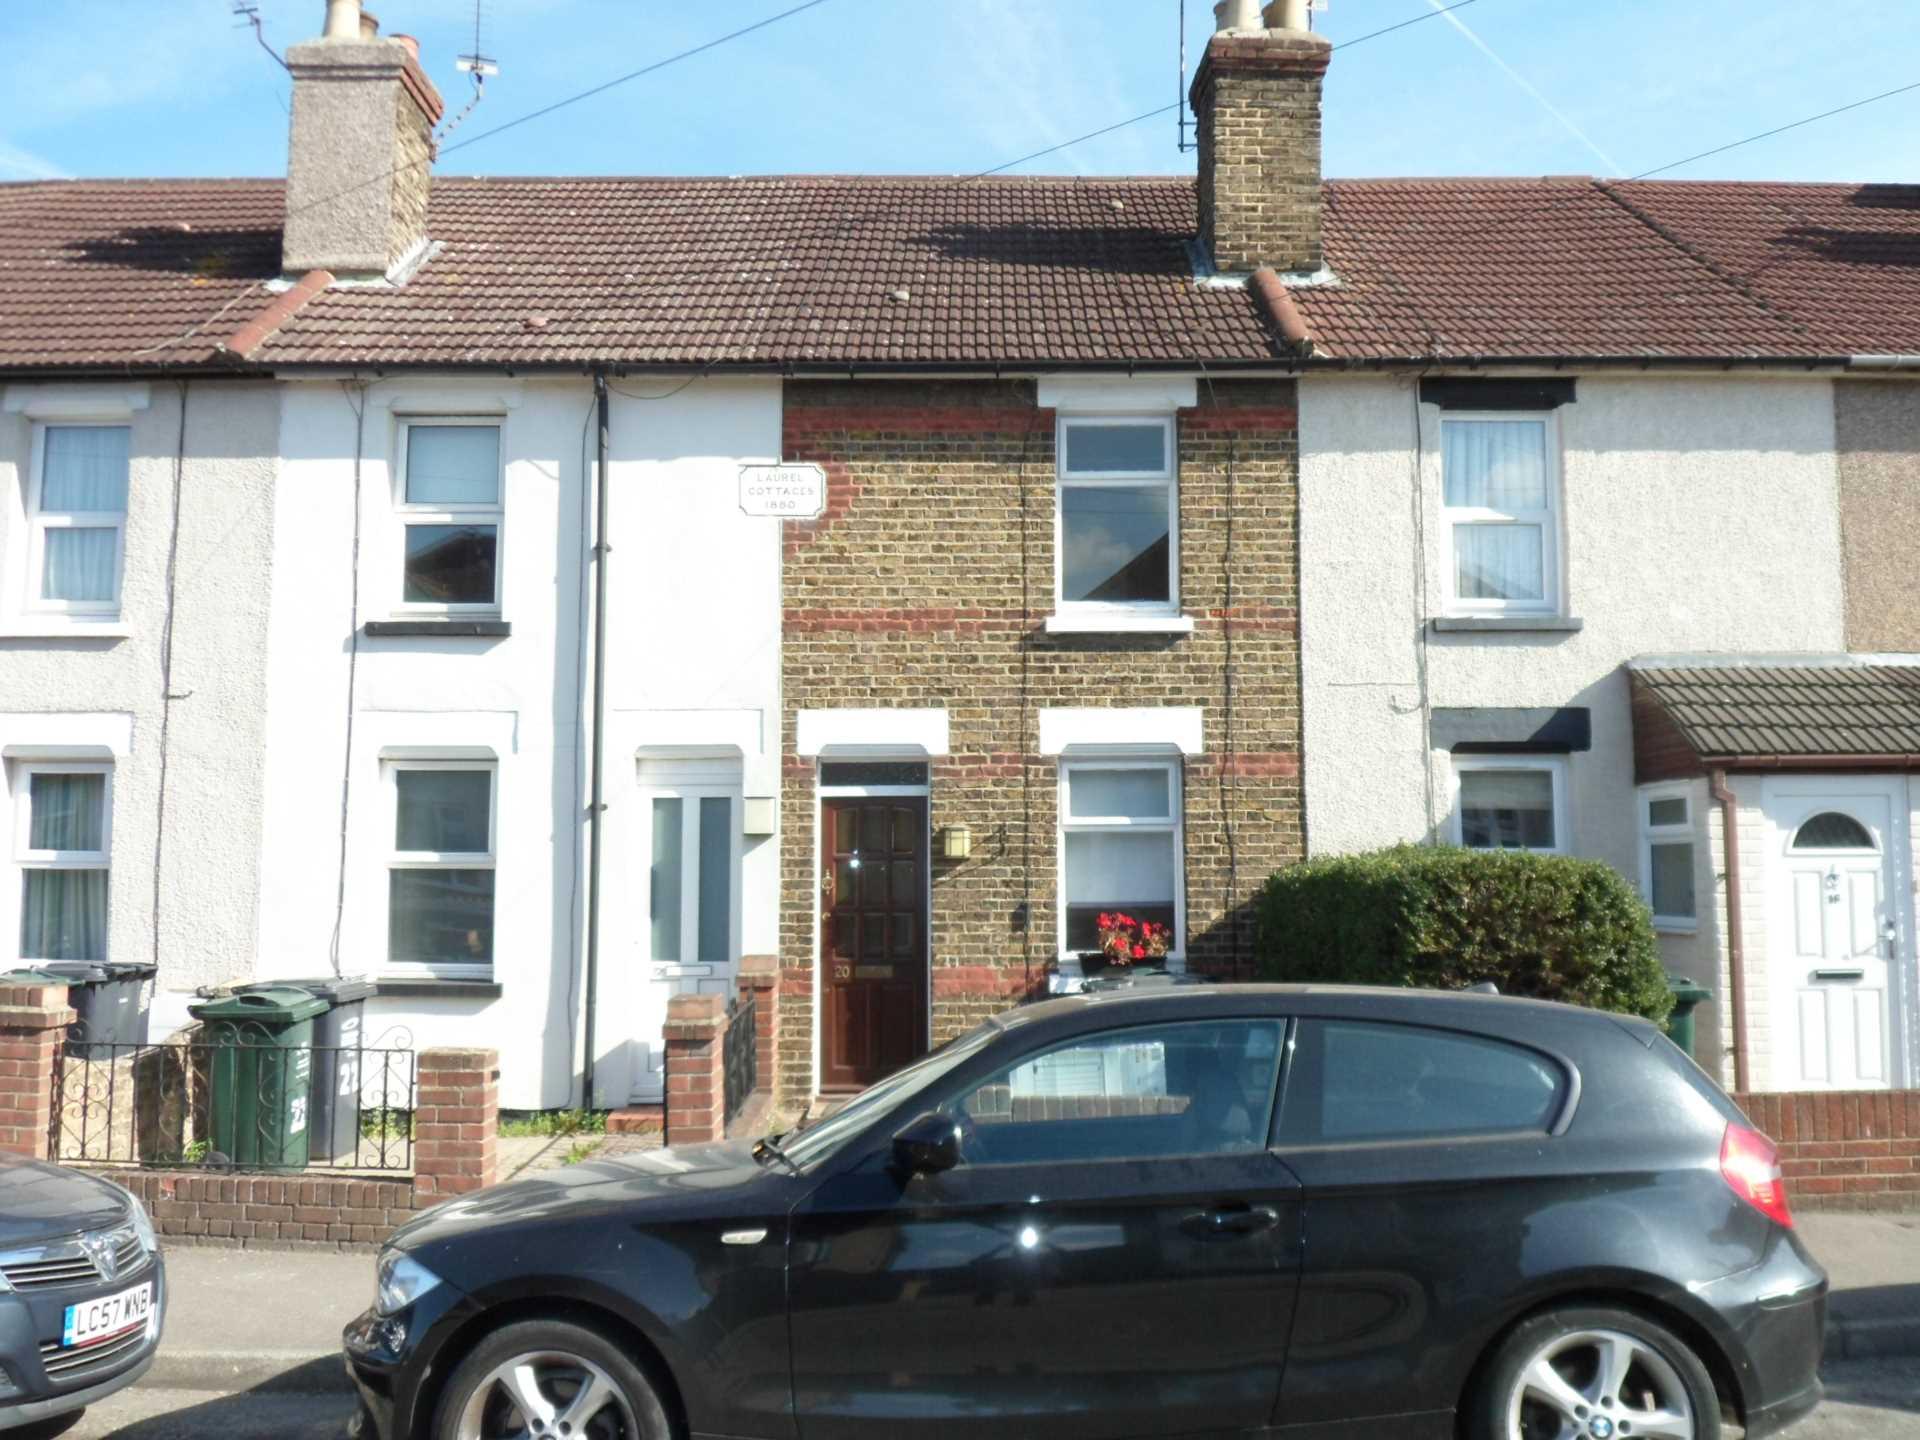 Property King Estate Agents - 2 Bedroom Terrace, Milestone Road, Dartford